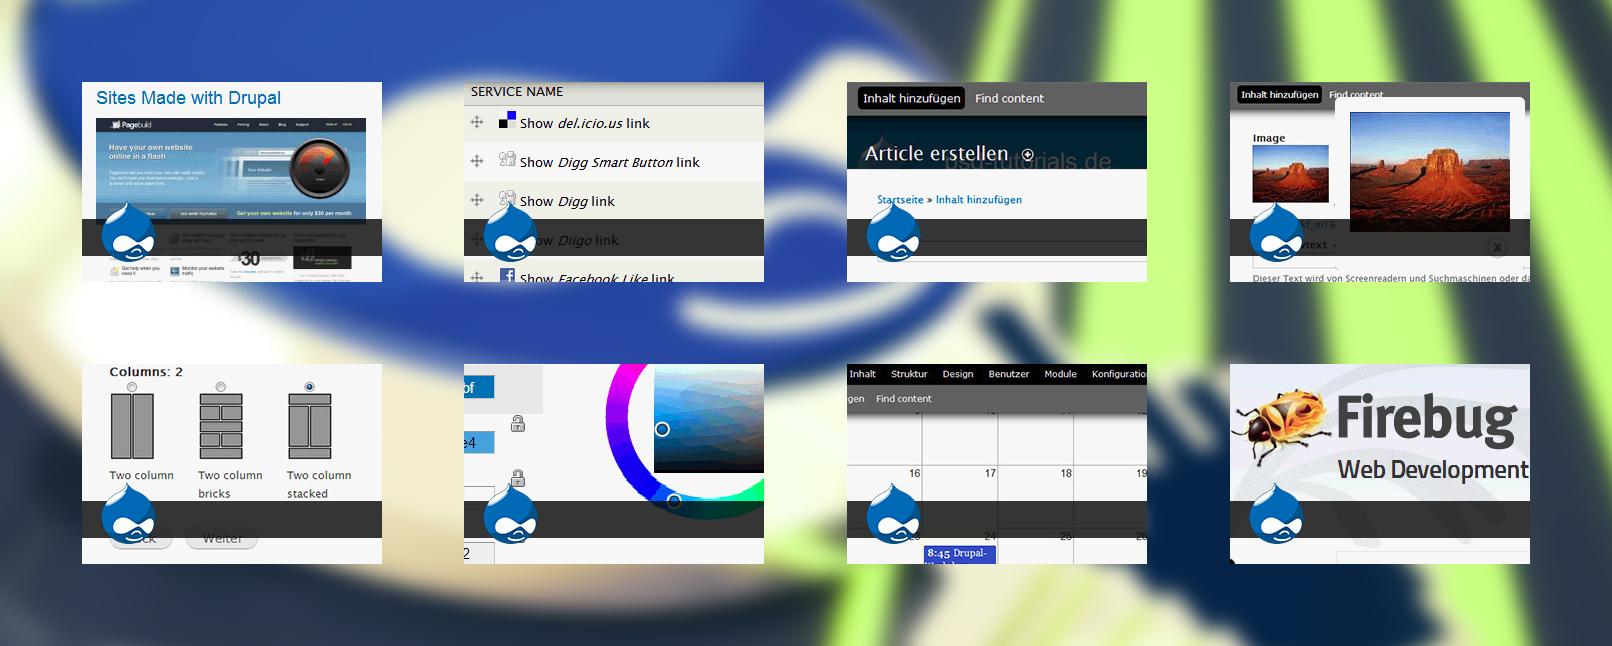 Auszüge aus dem Video-Tutorial zum CMS Drupal